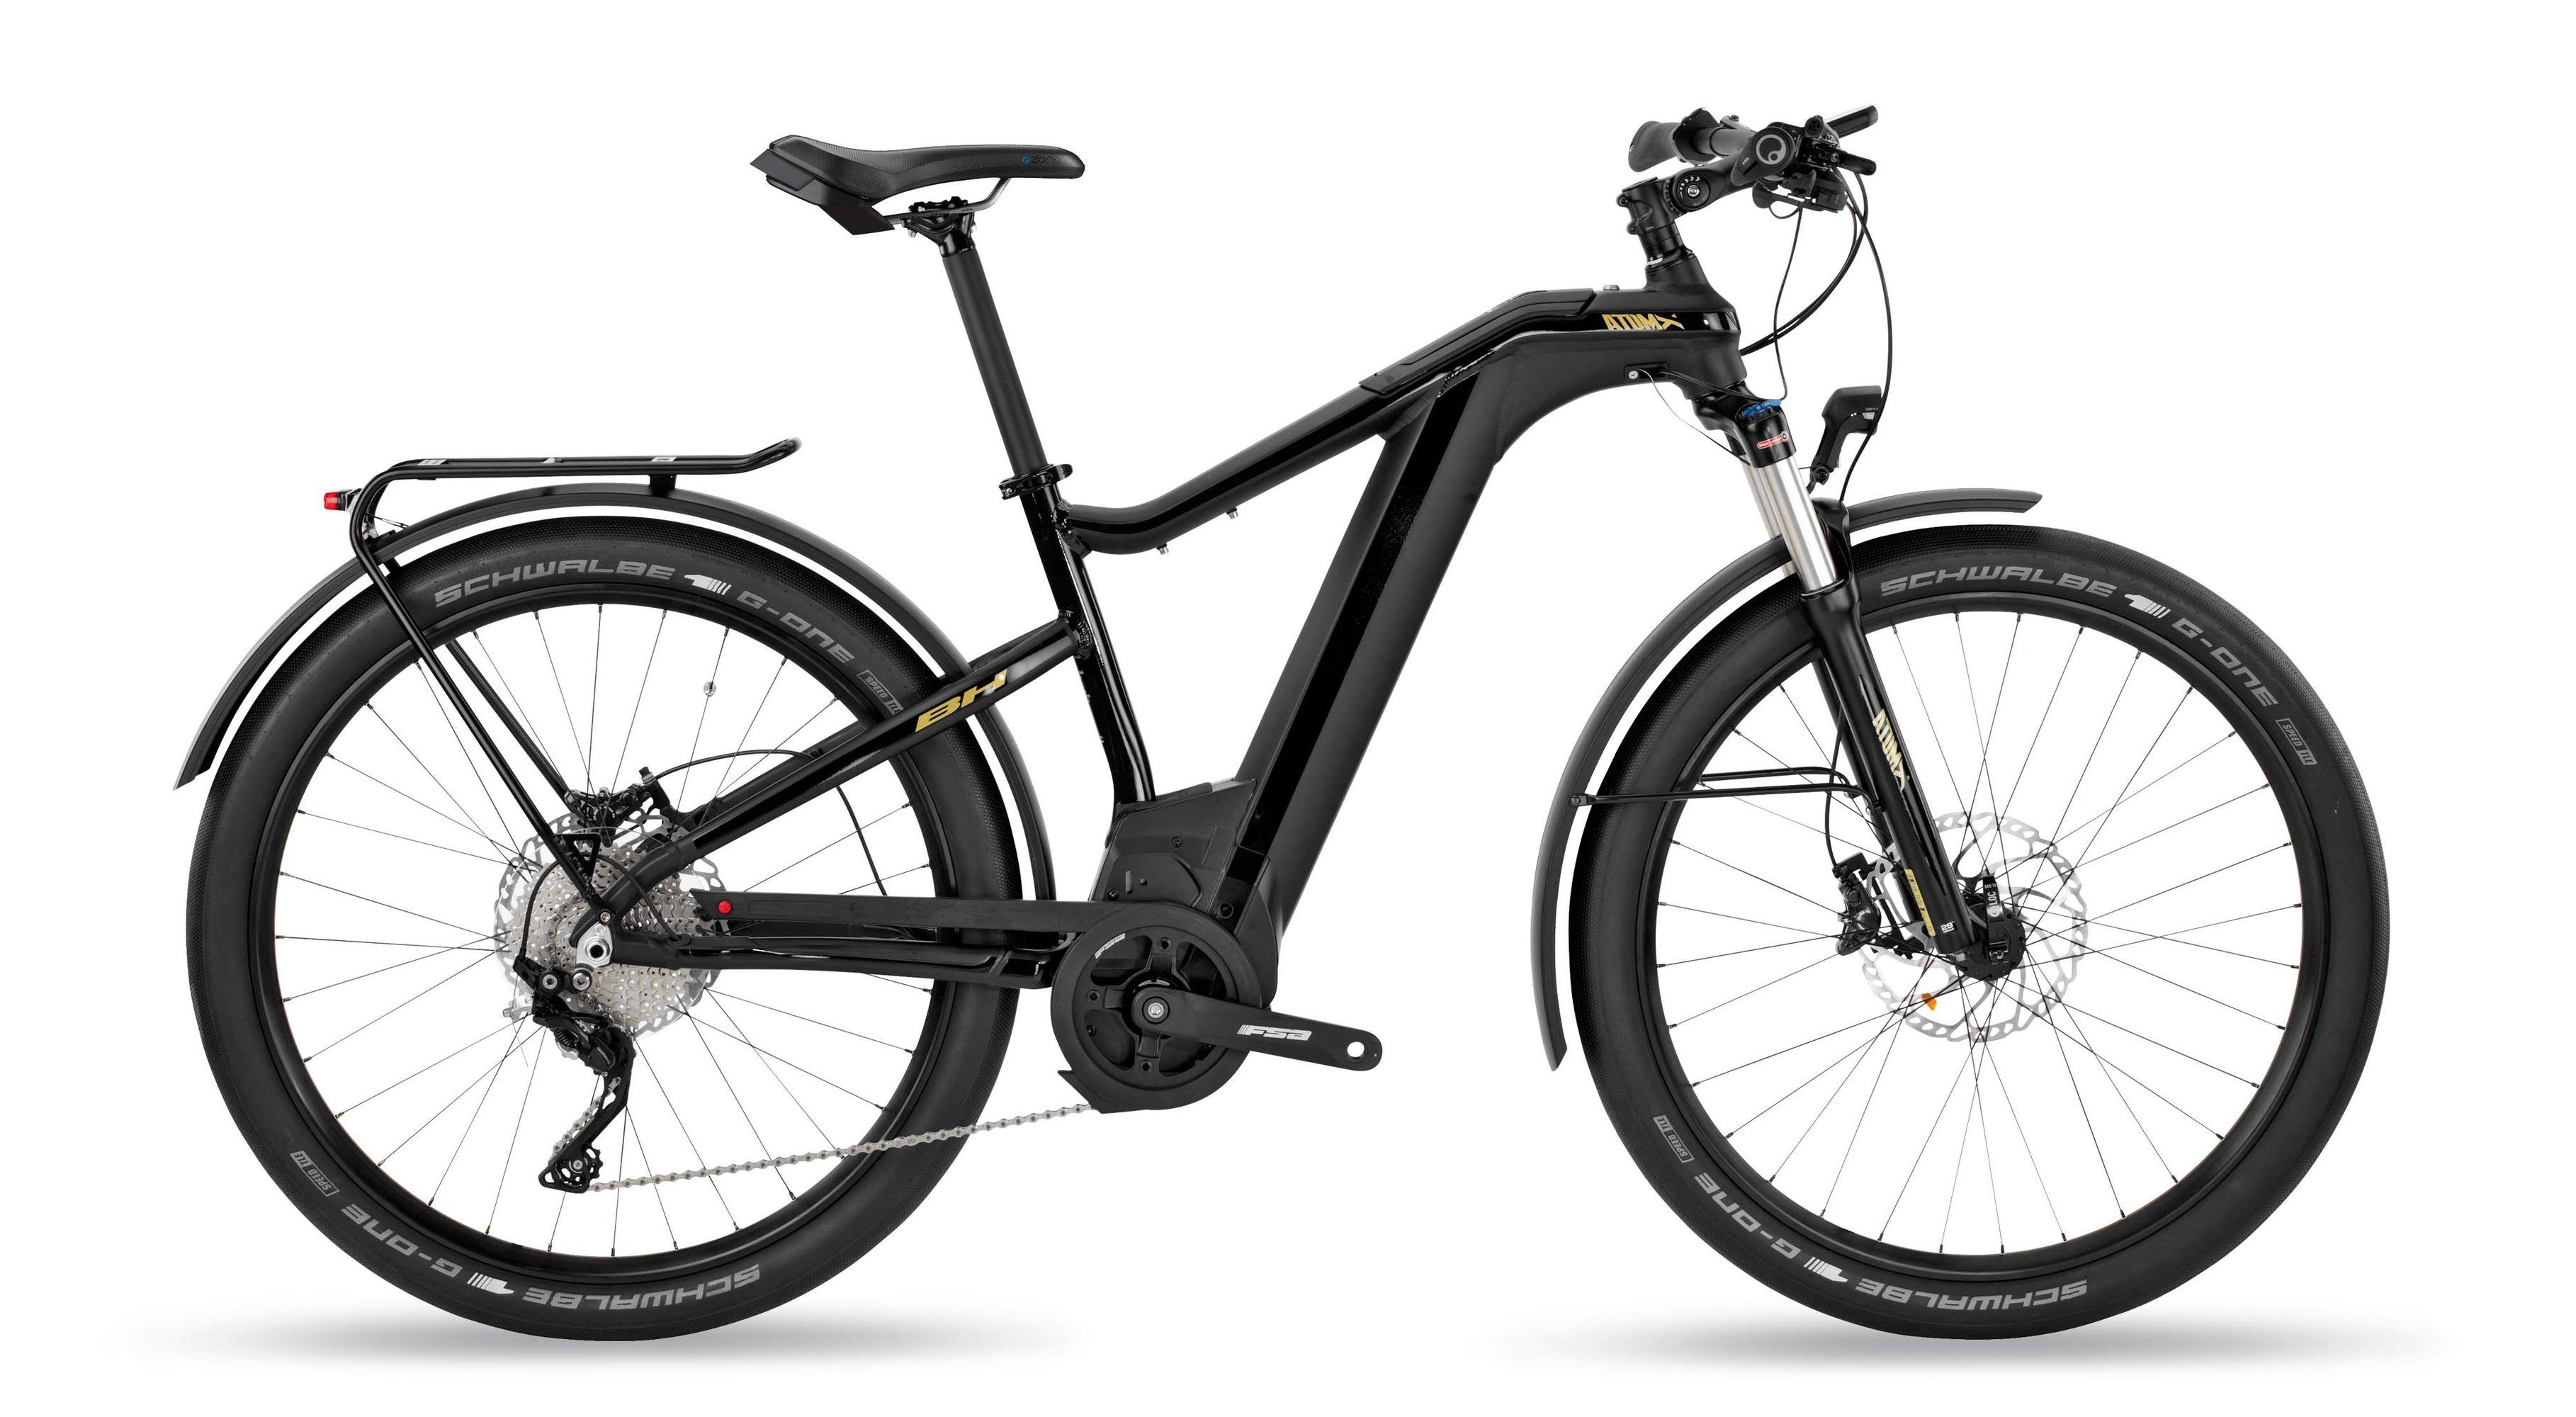 greenbike pesaro-bici elettriche-BHbikes-motore centrale-Atom-X Cross Pro